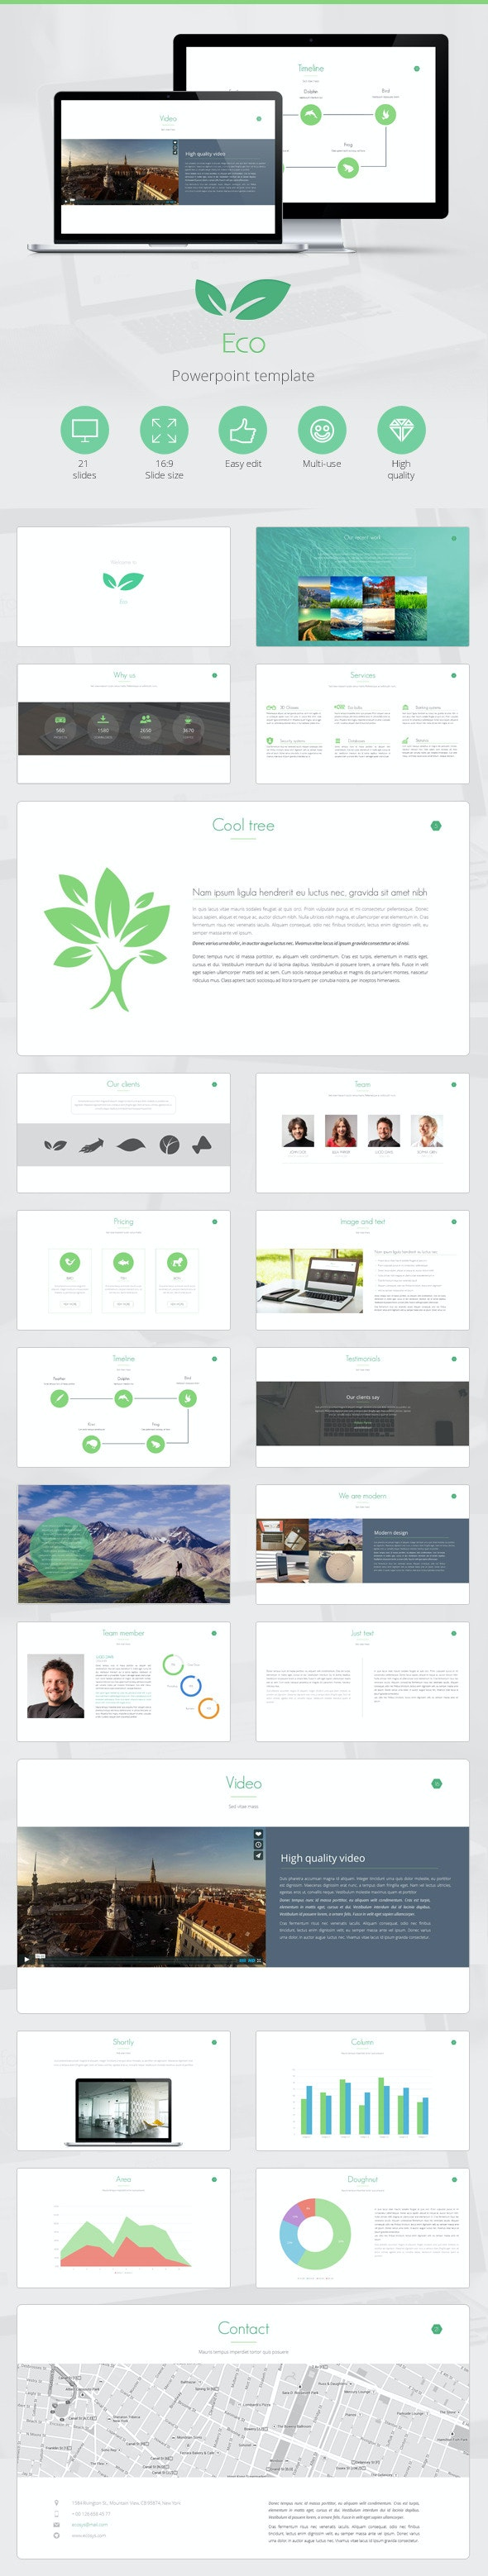 Eco Powerpoint Presentation Template - Creative PowerPoint Templates